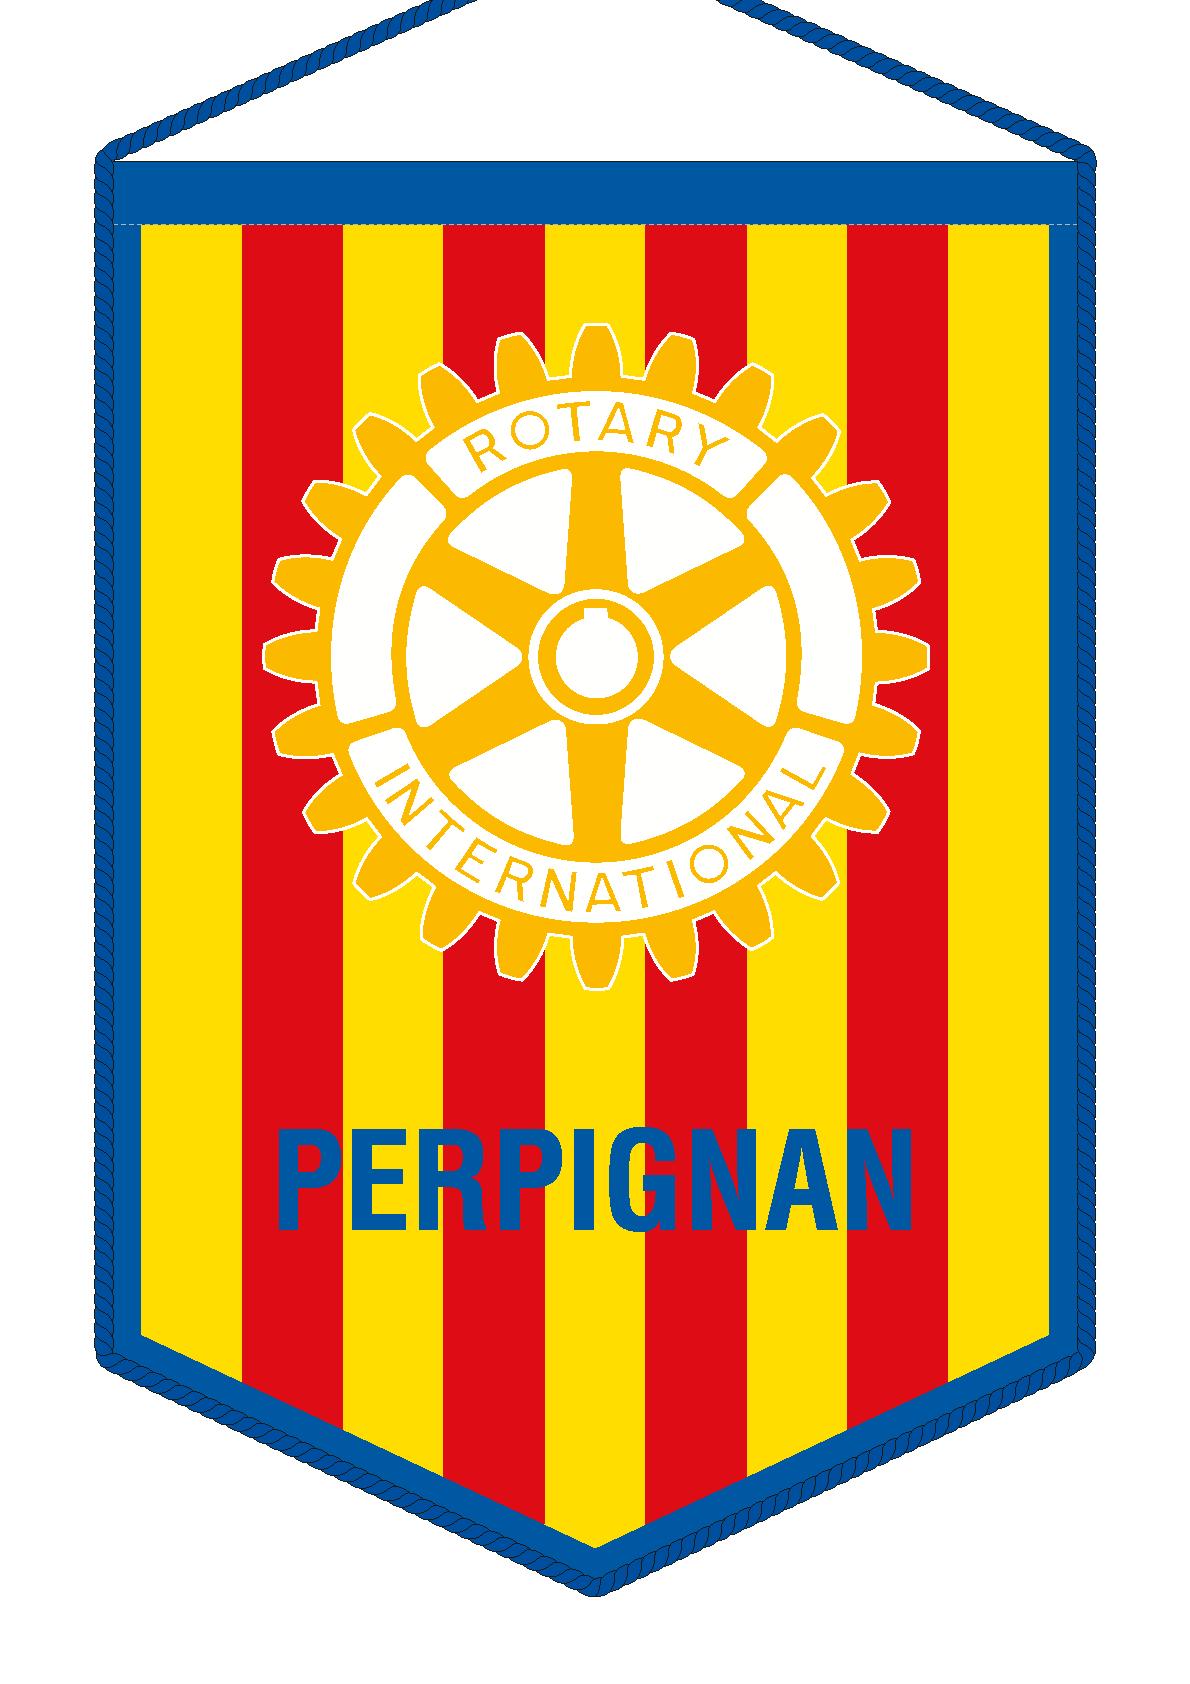 FANION ROTARY CLUB PERPIGNAN